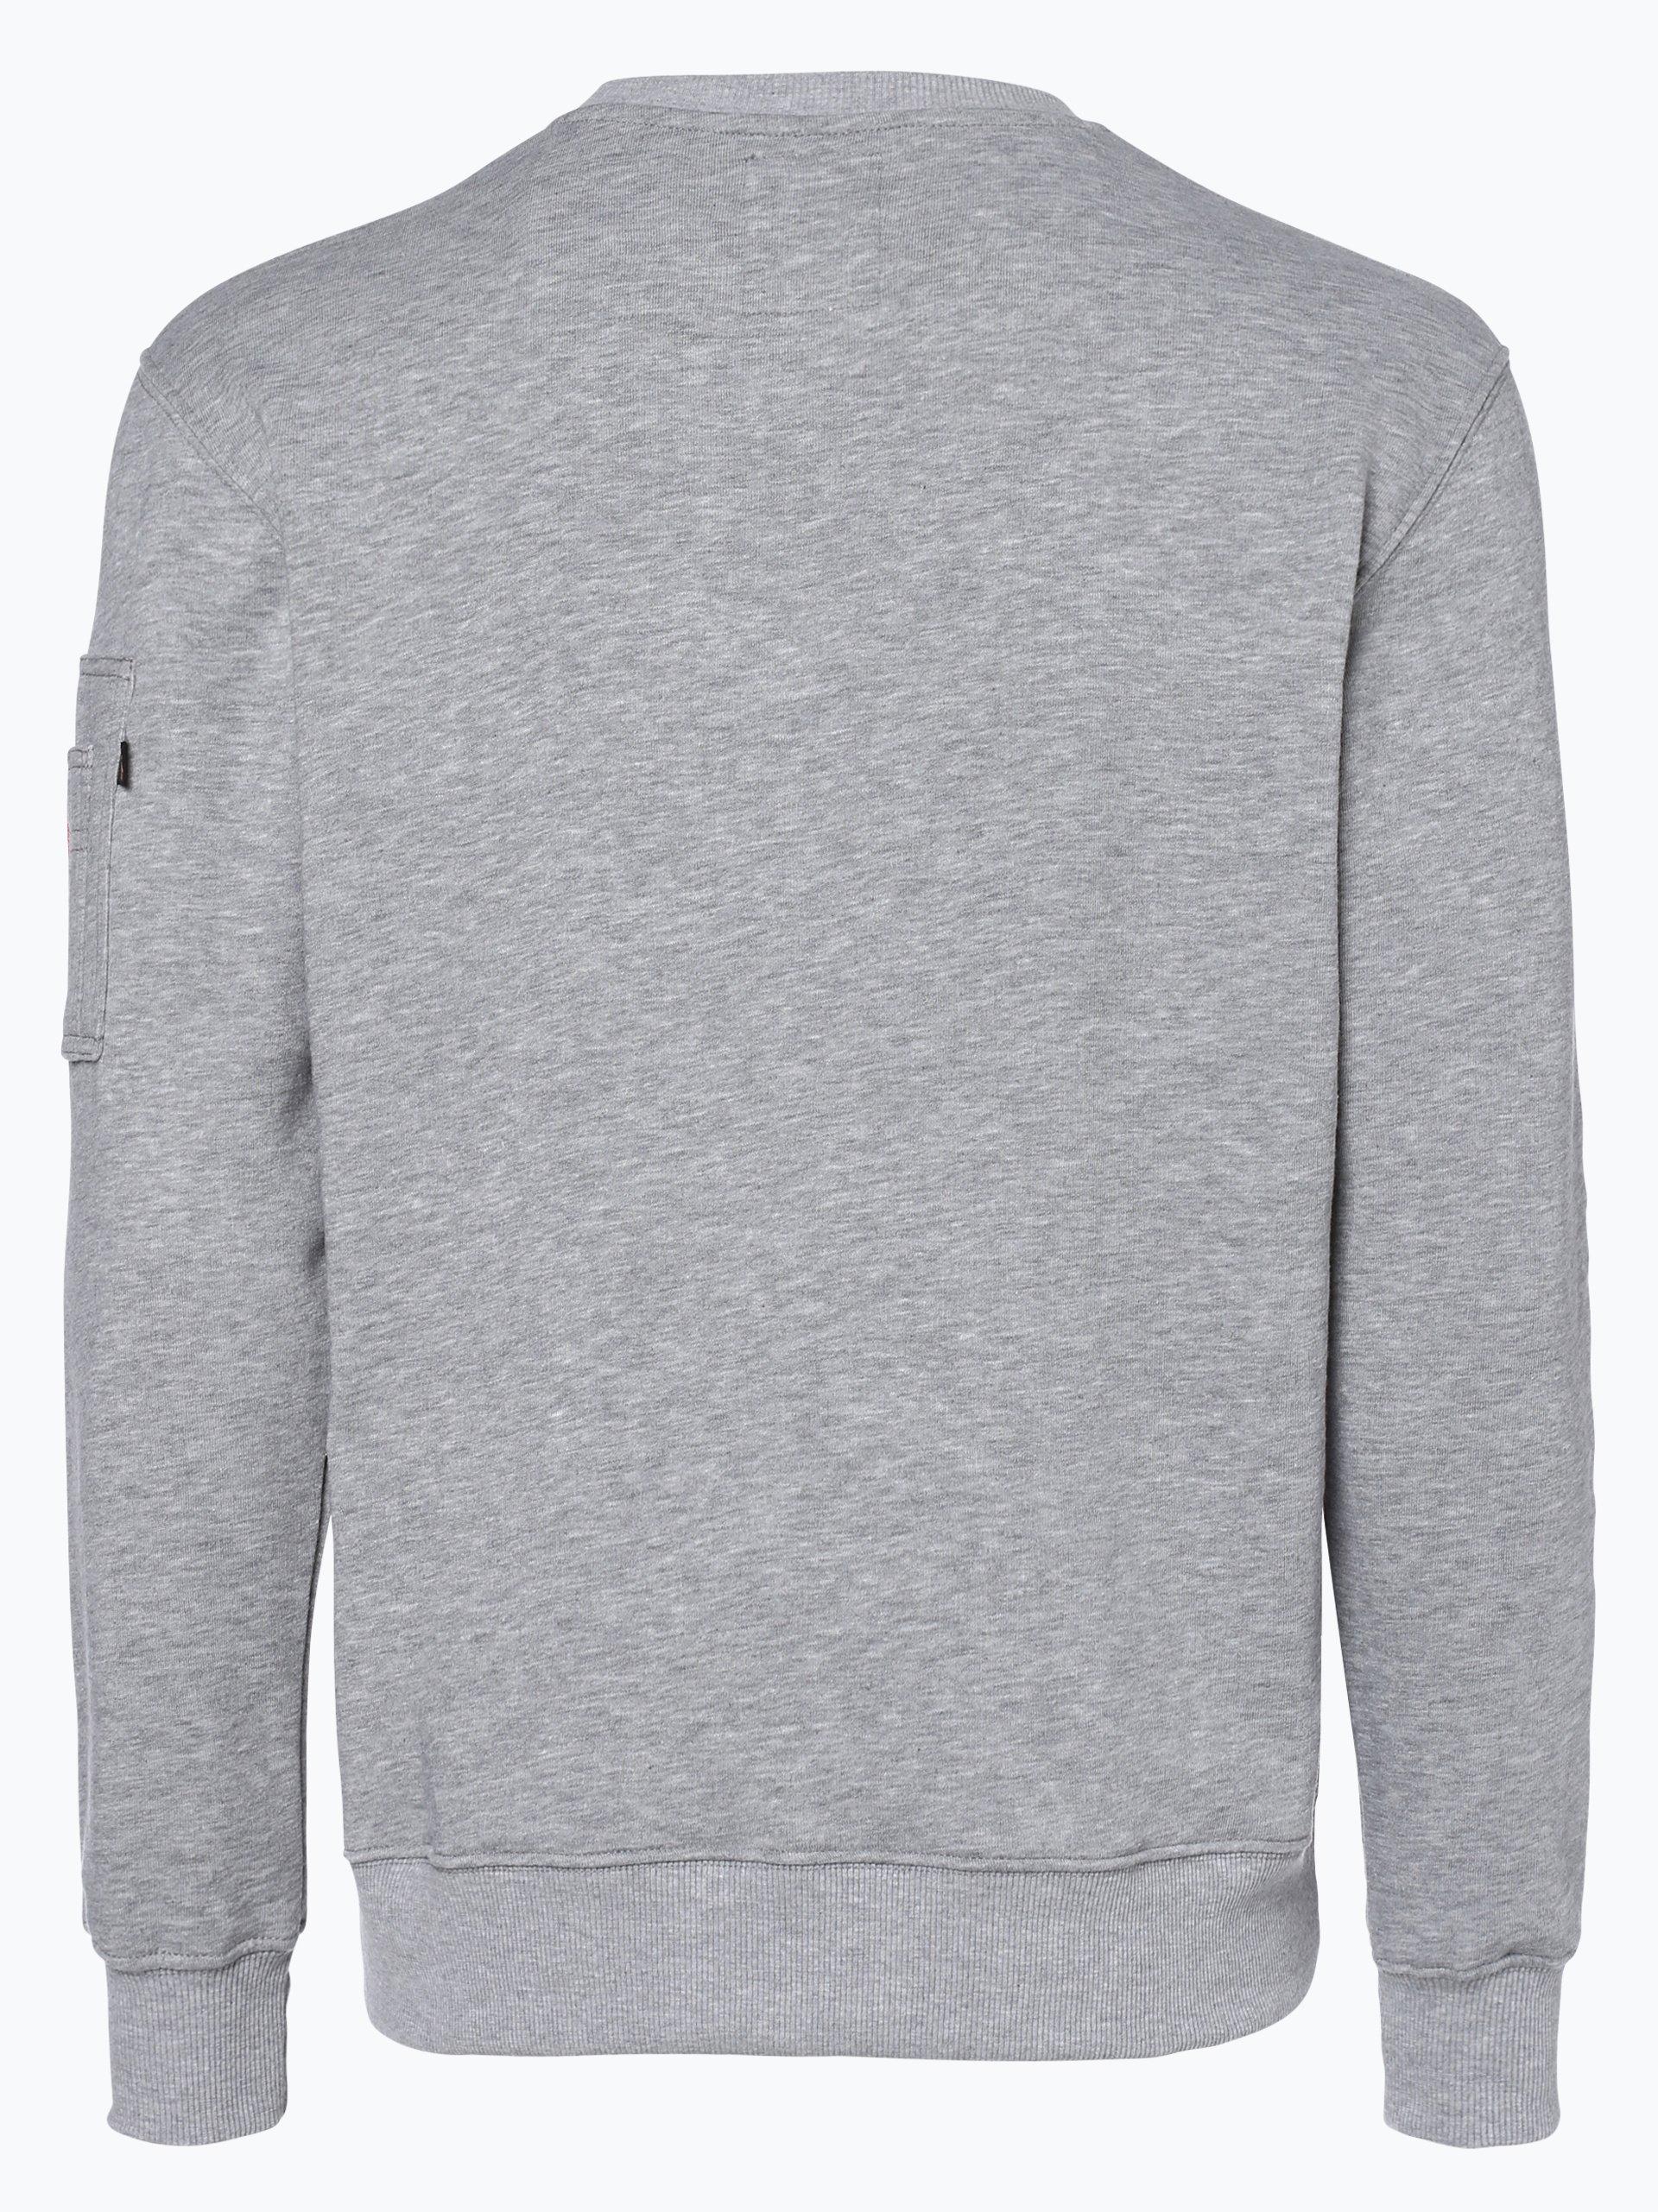 alpha industries herren sweatshirt grau gemustert online. Black Bedroom Furniture Sets. Home Design Ideas